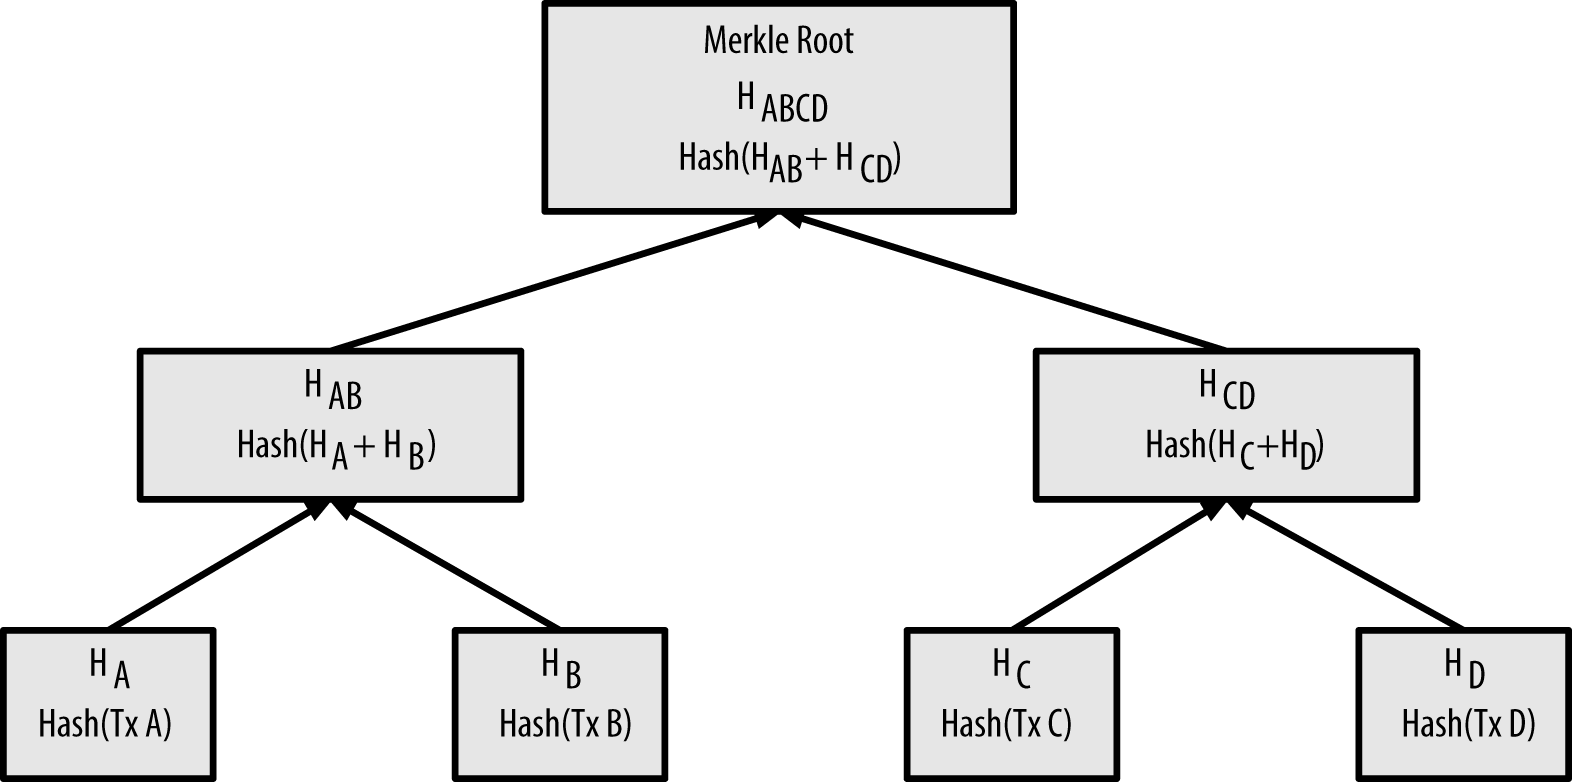 Merkel tree